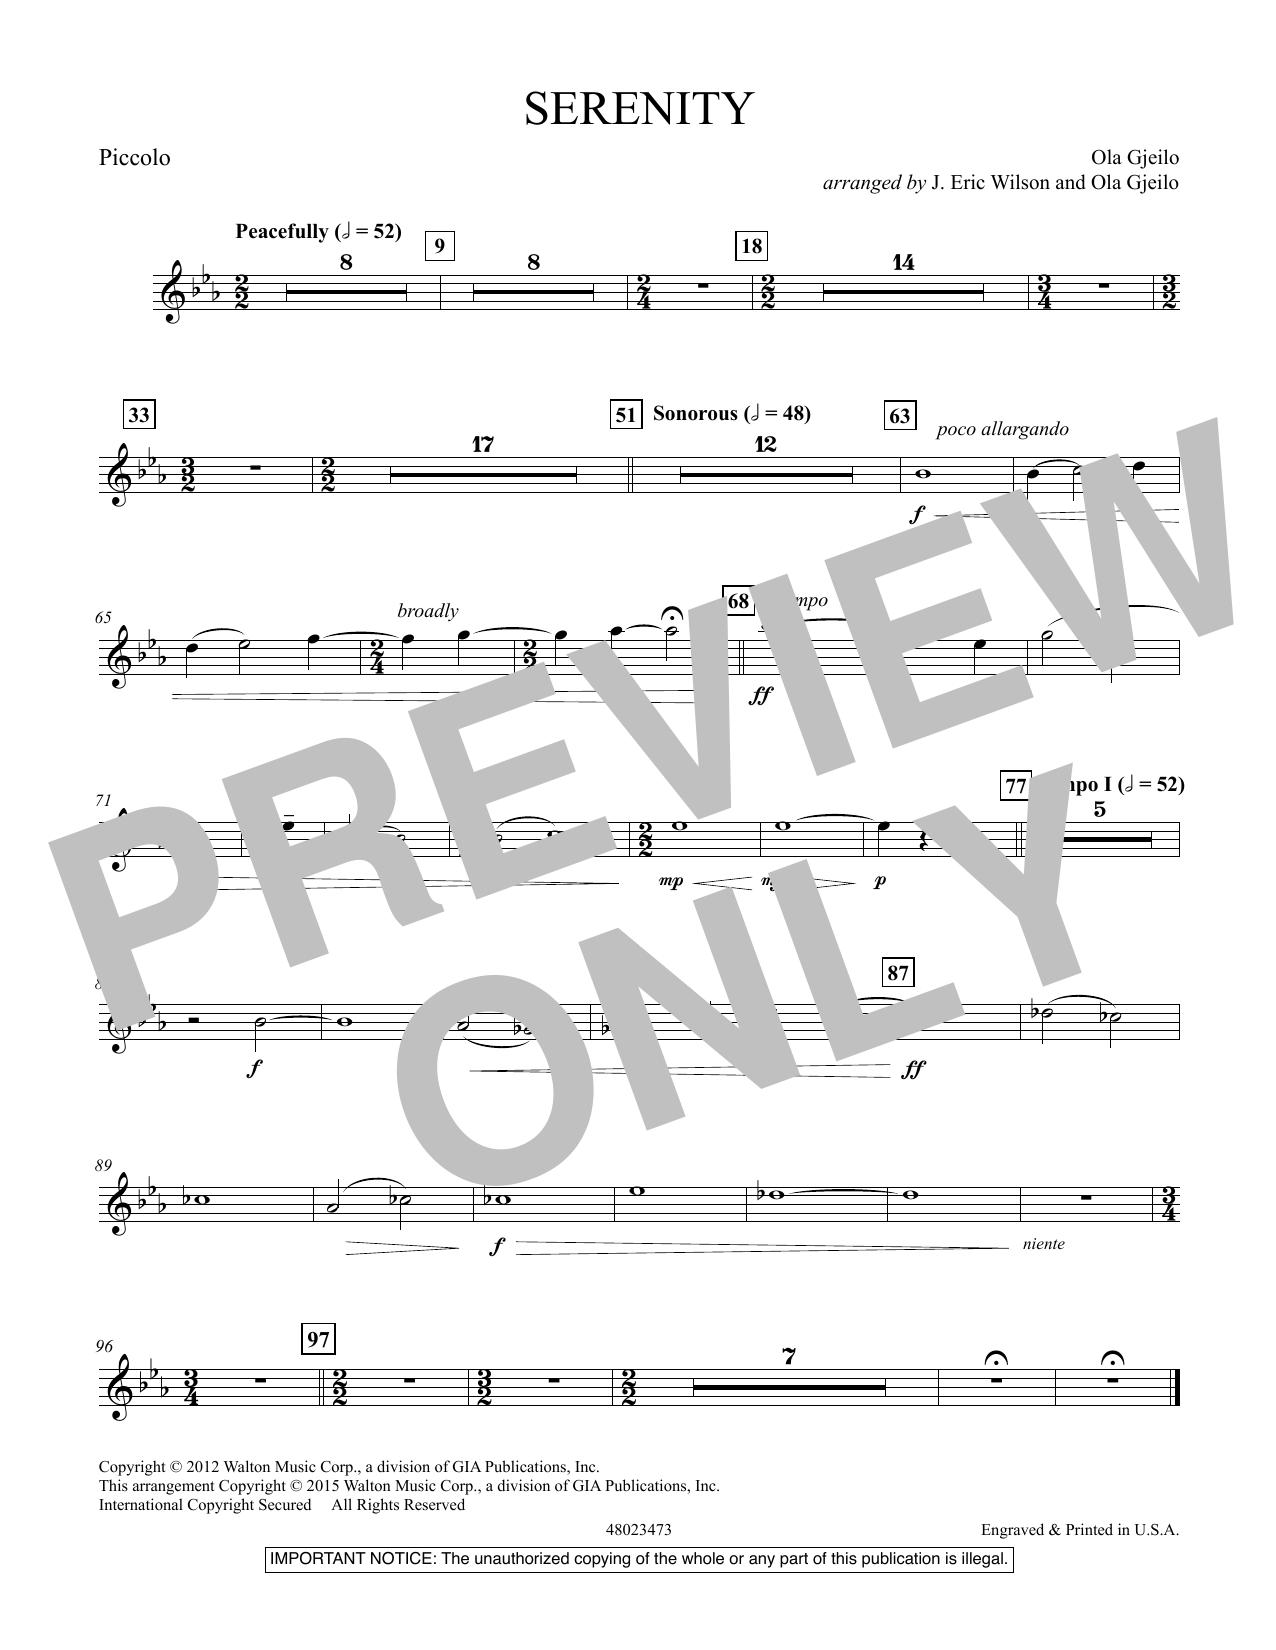 Serenity - Piccolo (Concert Band)